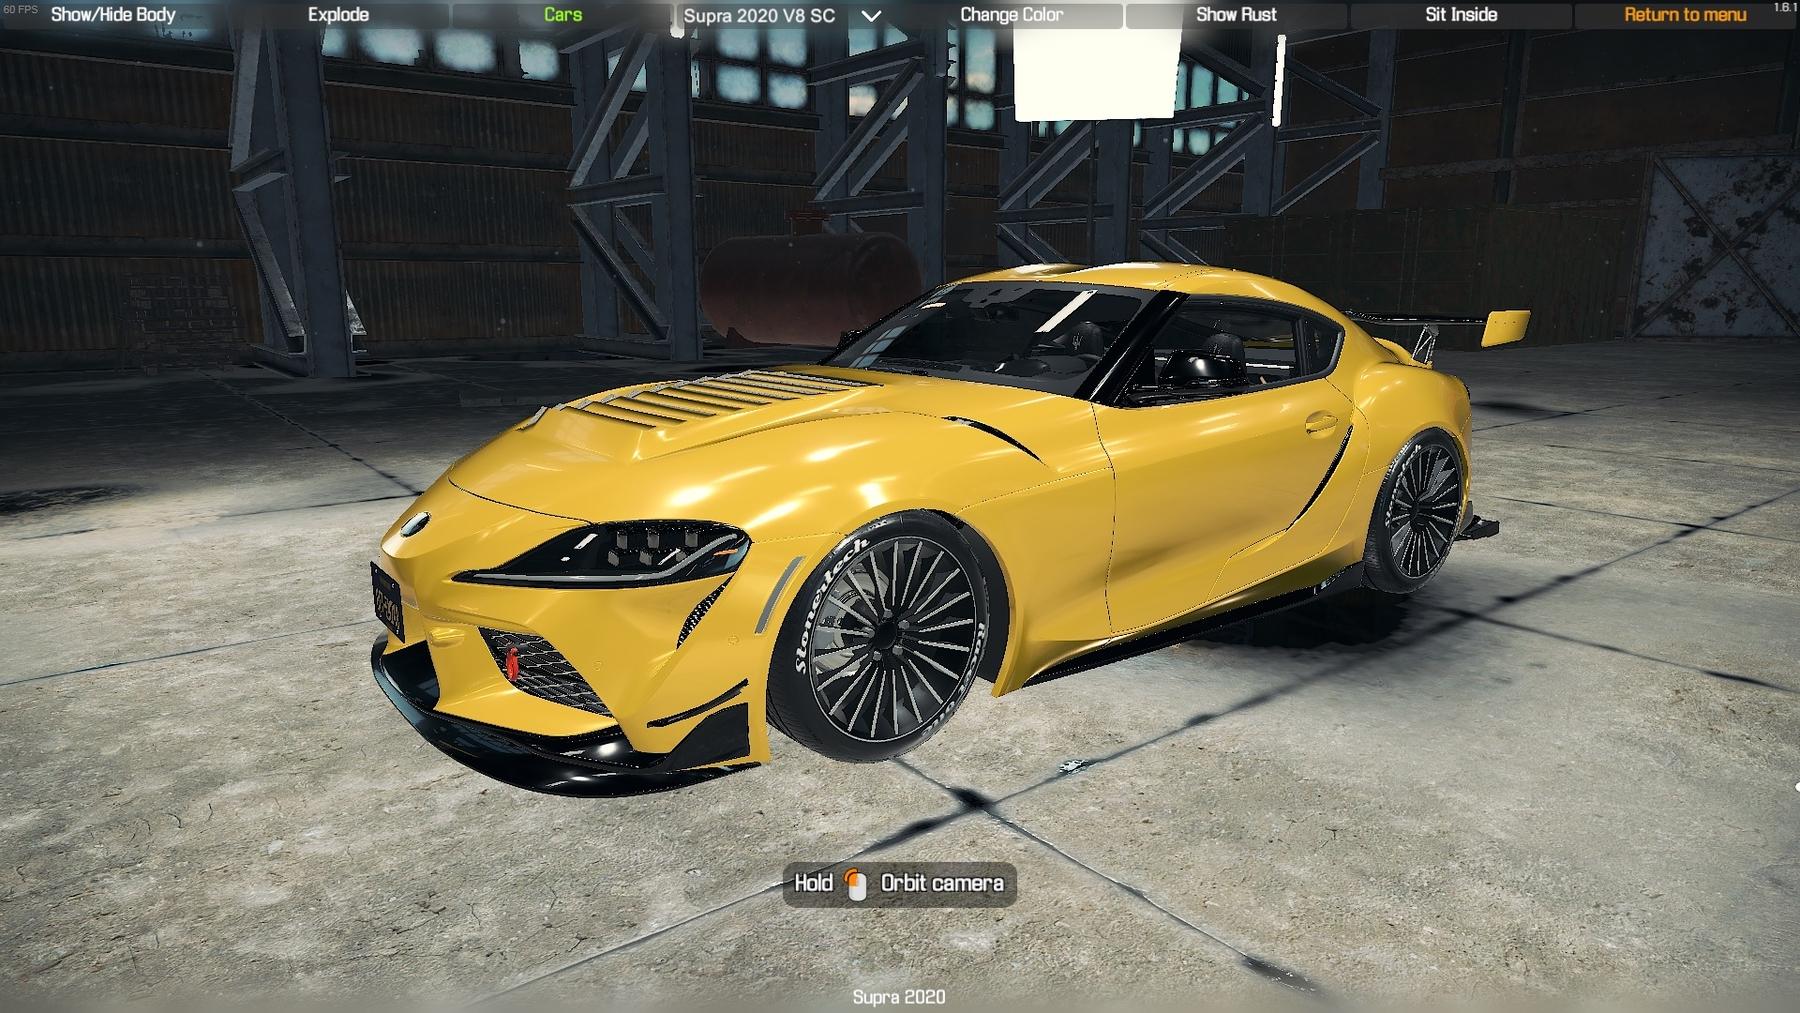 2020 Toyota Supra - CMS 2018 Cars - Car Mechanic Simulator